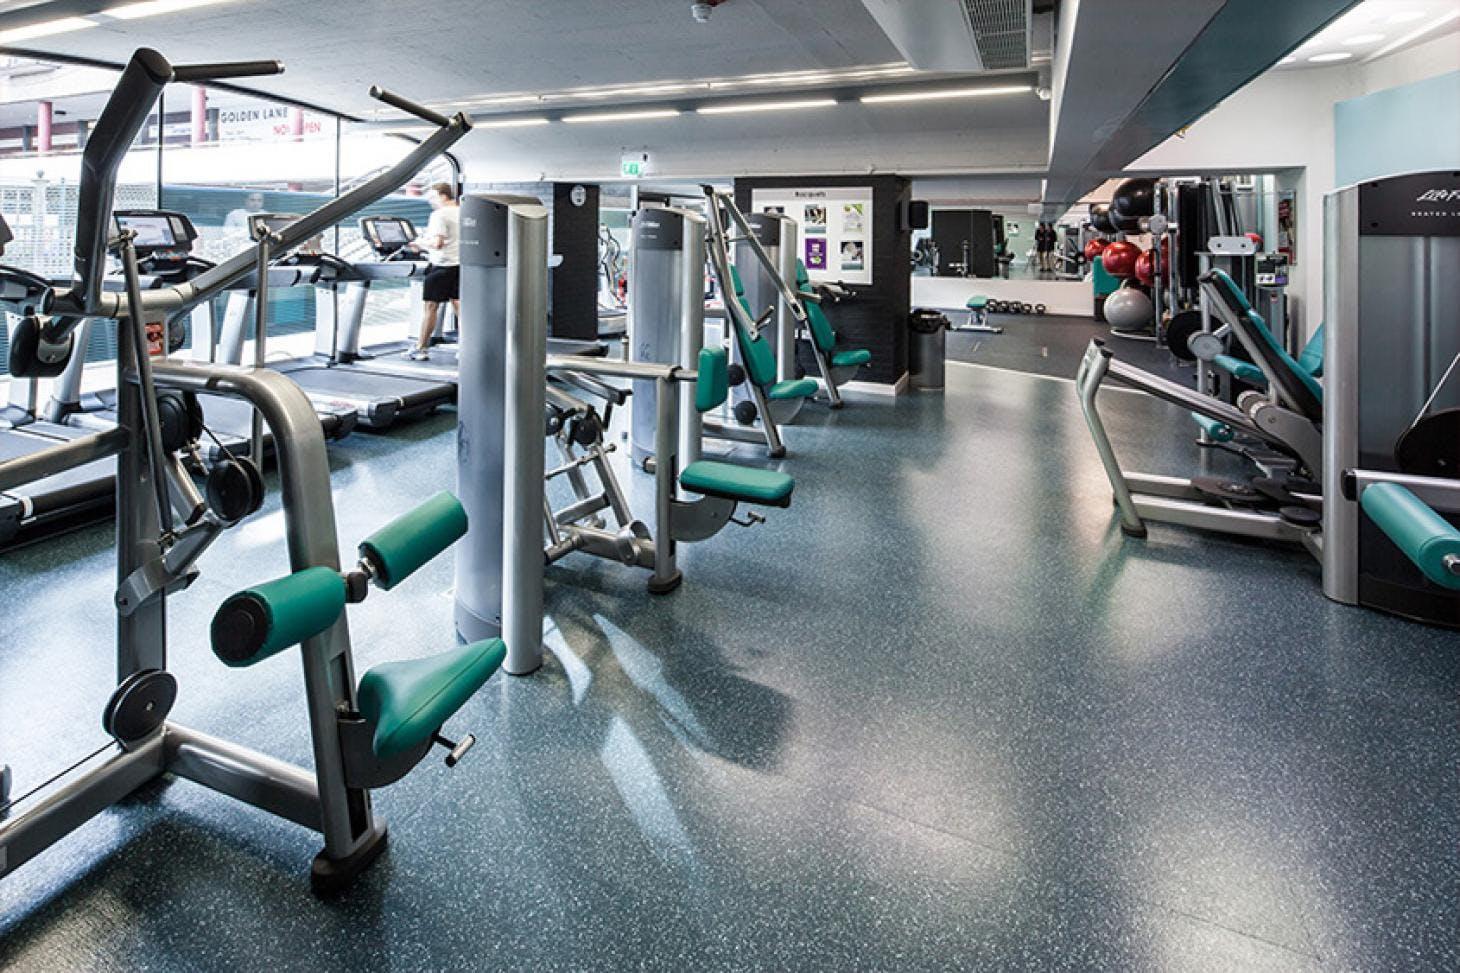 Golden Lane Leisure Centre Gym gym